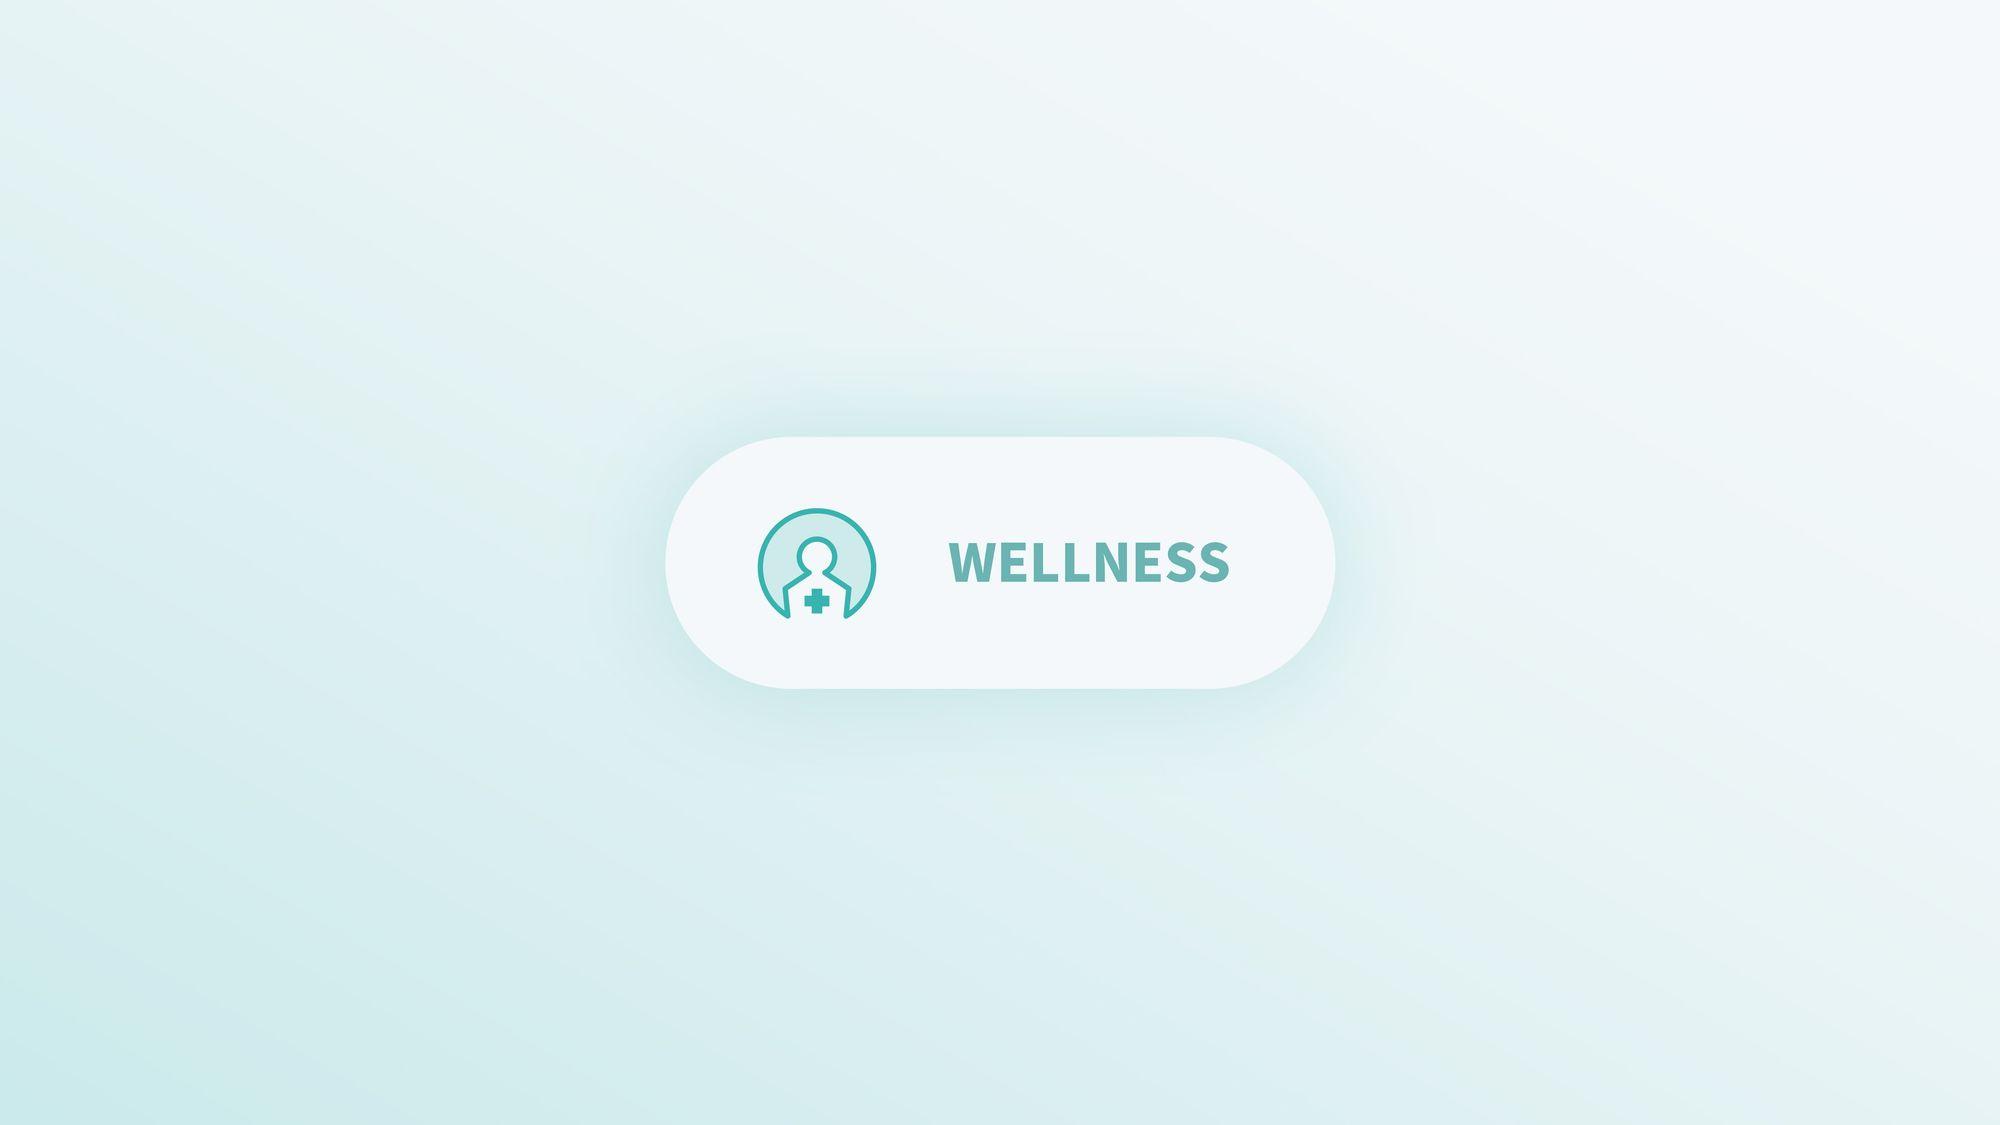 Wellness_Icon  6  6